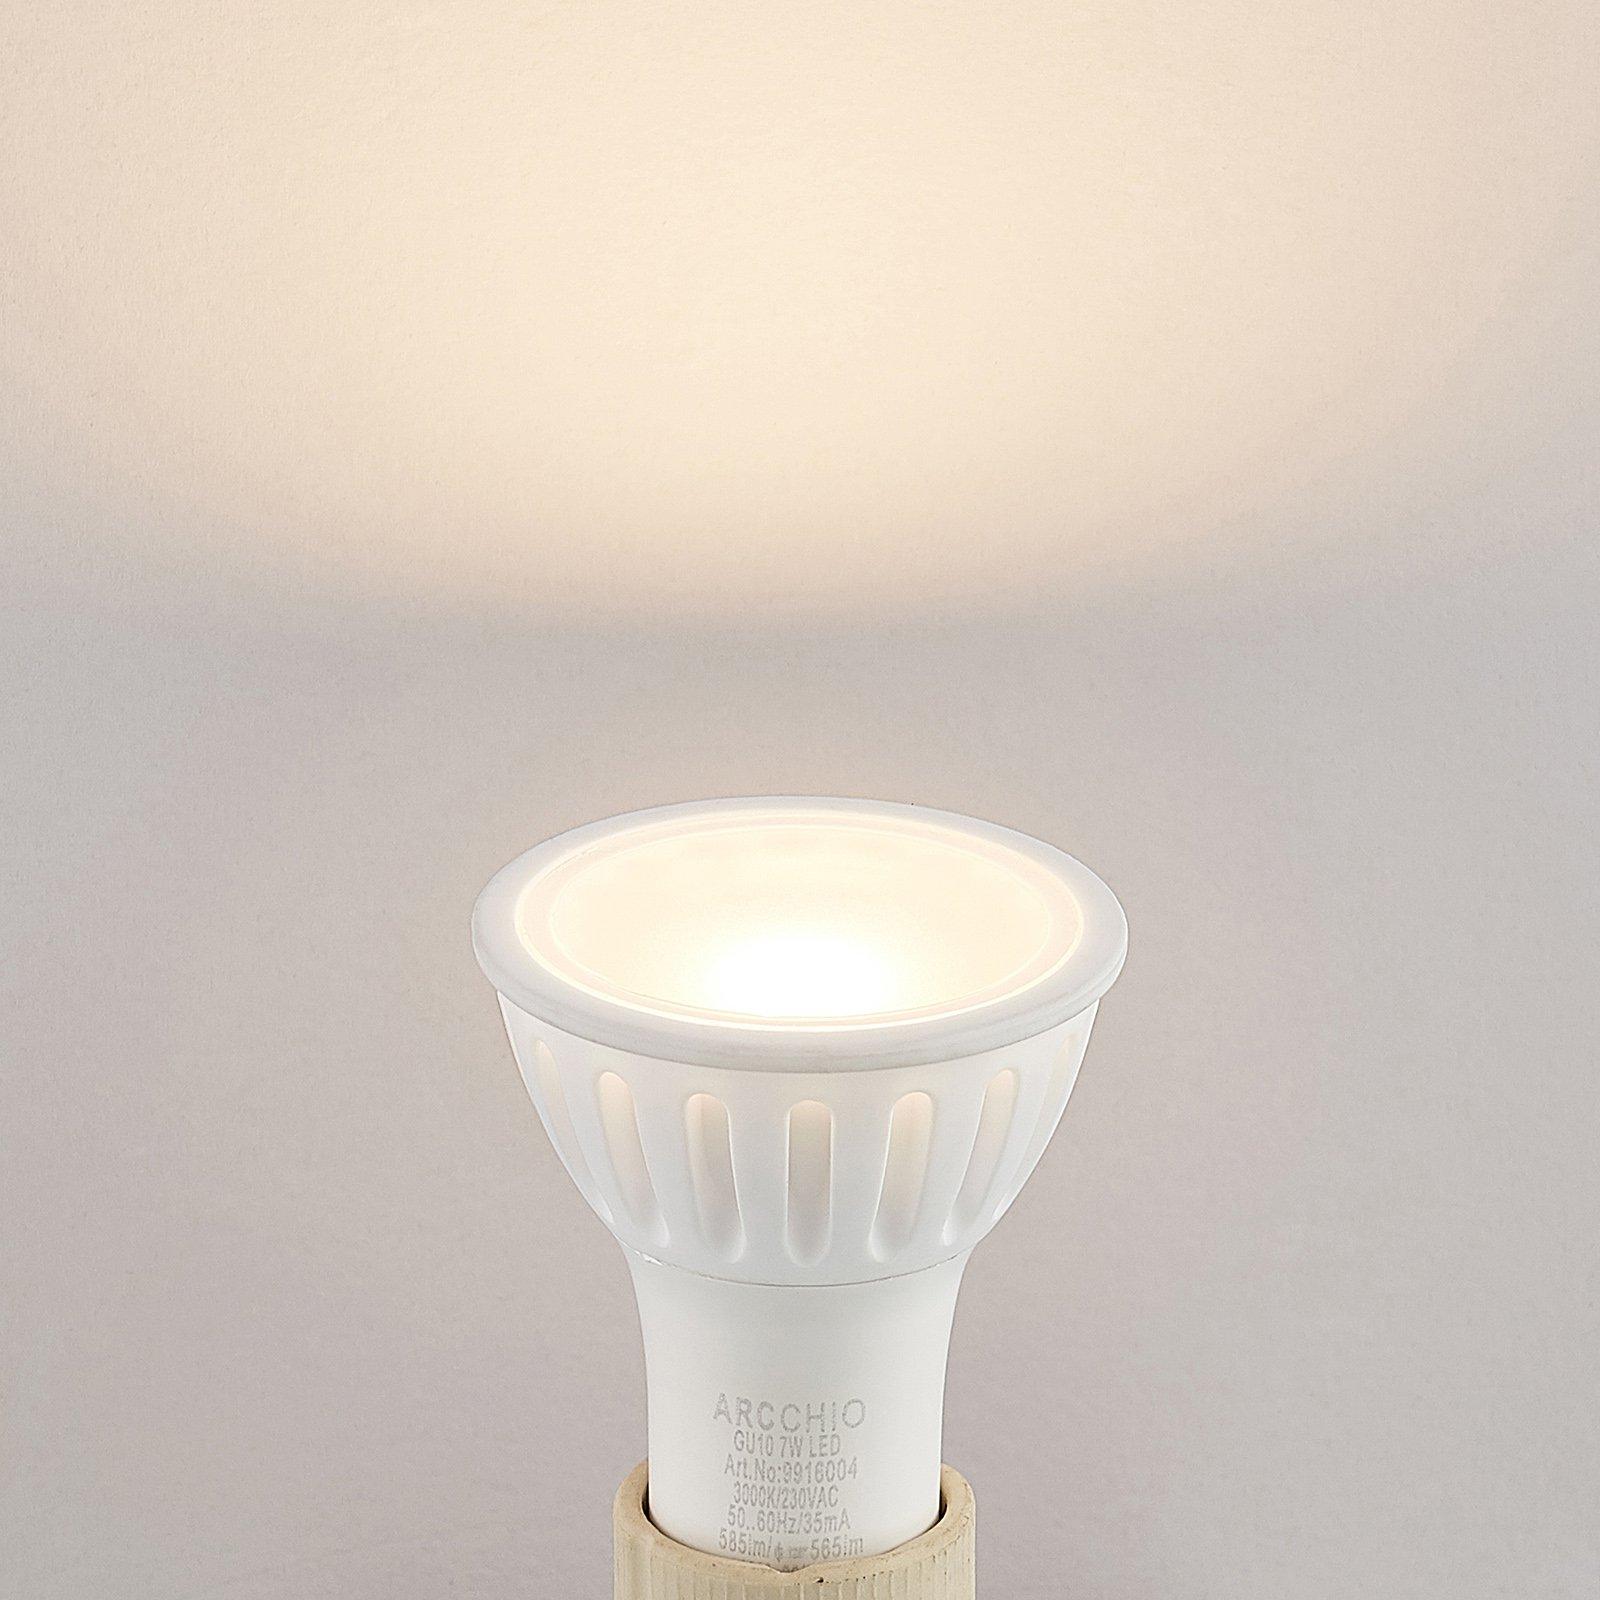 Arcchio LED-reflektor GU10 100° 7 W 3 000 K dimbar